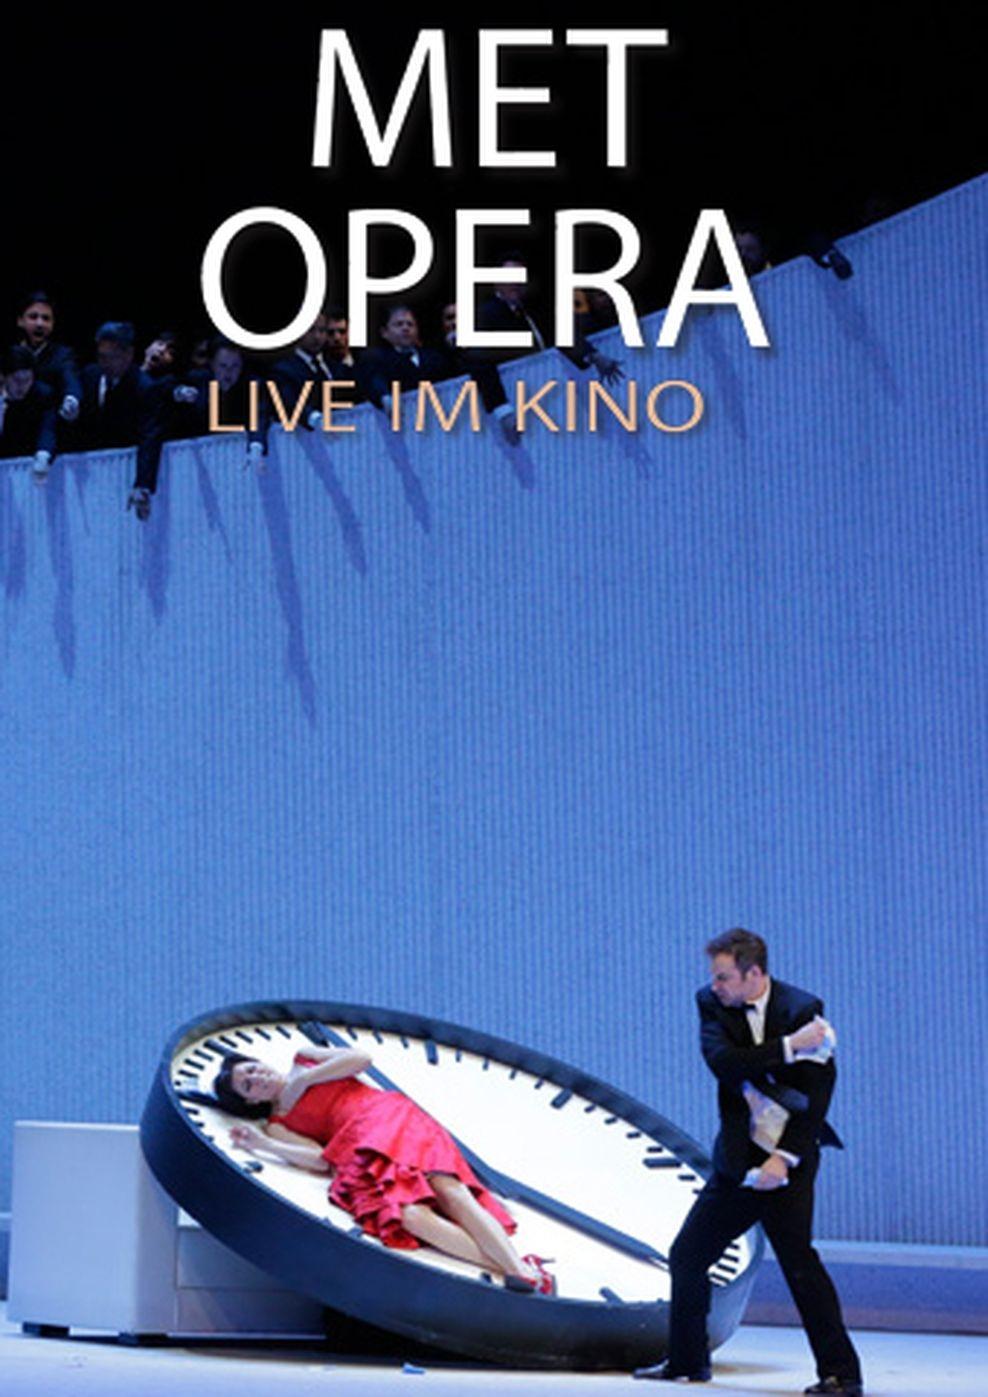 Met Opera 2016/17: La Traviata (Verdi) (Poster)